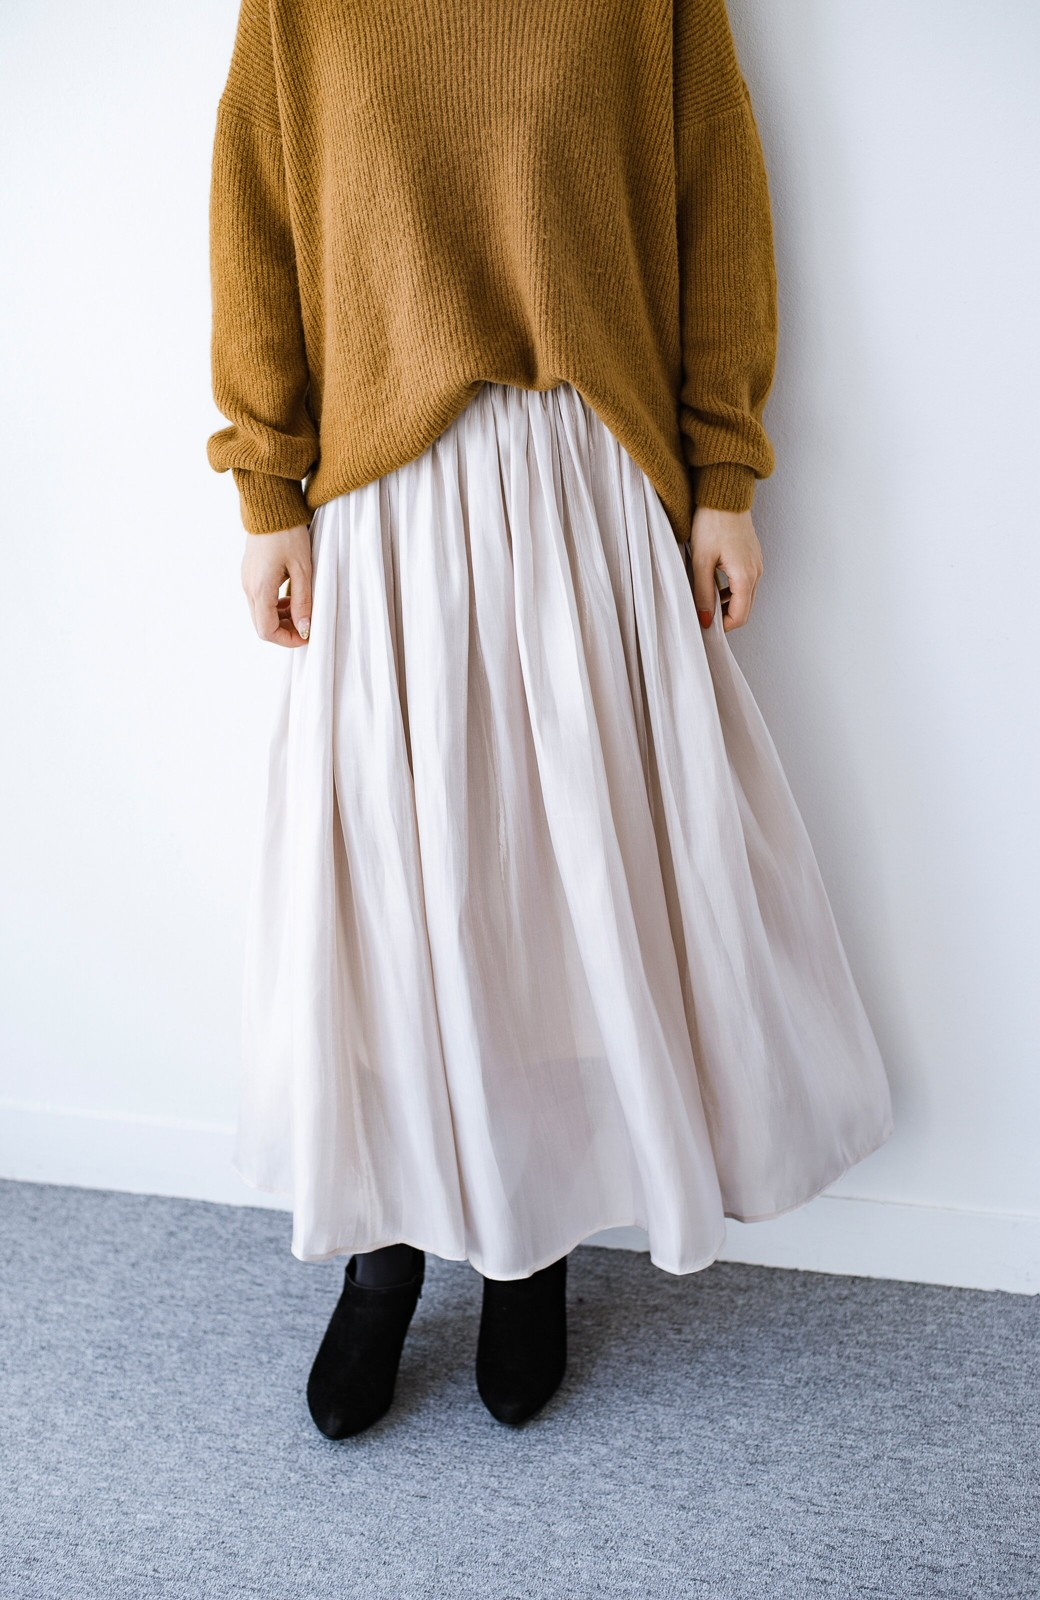 haco! 【人気のため新色追加!】1枚でも重ね着にも便利なキラキラ素材がかわいいロングスカート by laulea <アイボリー>の商品写真3